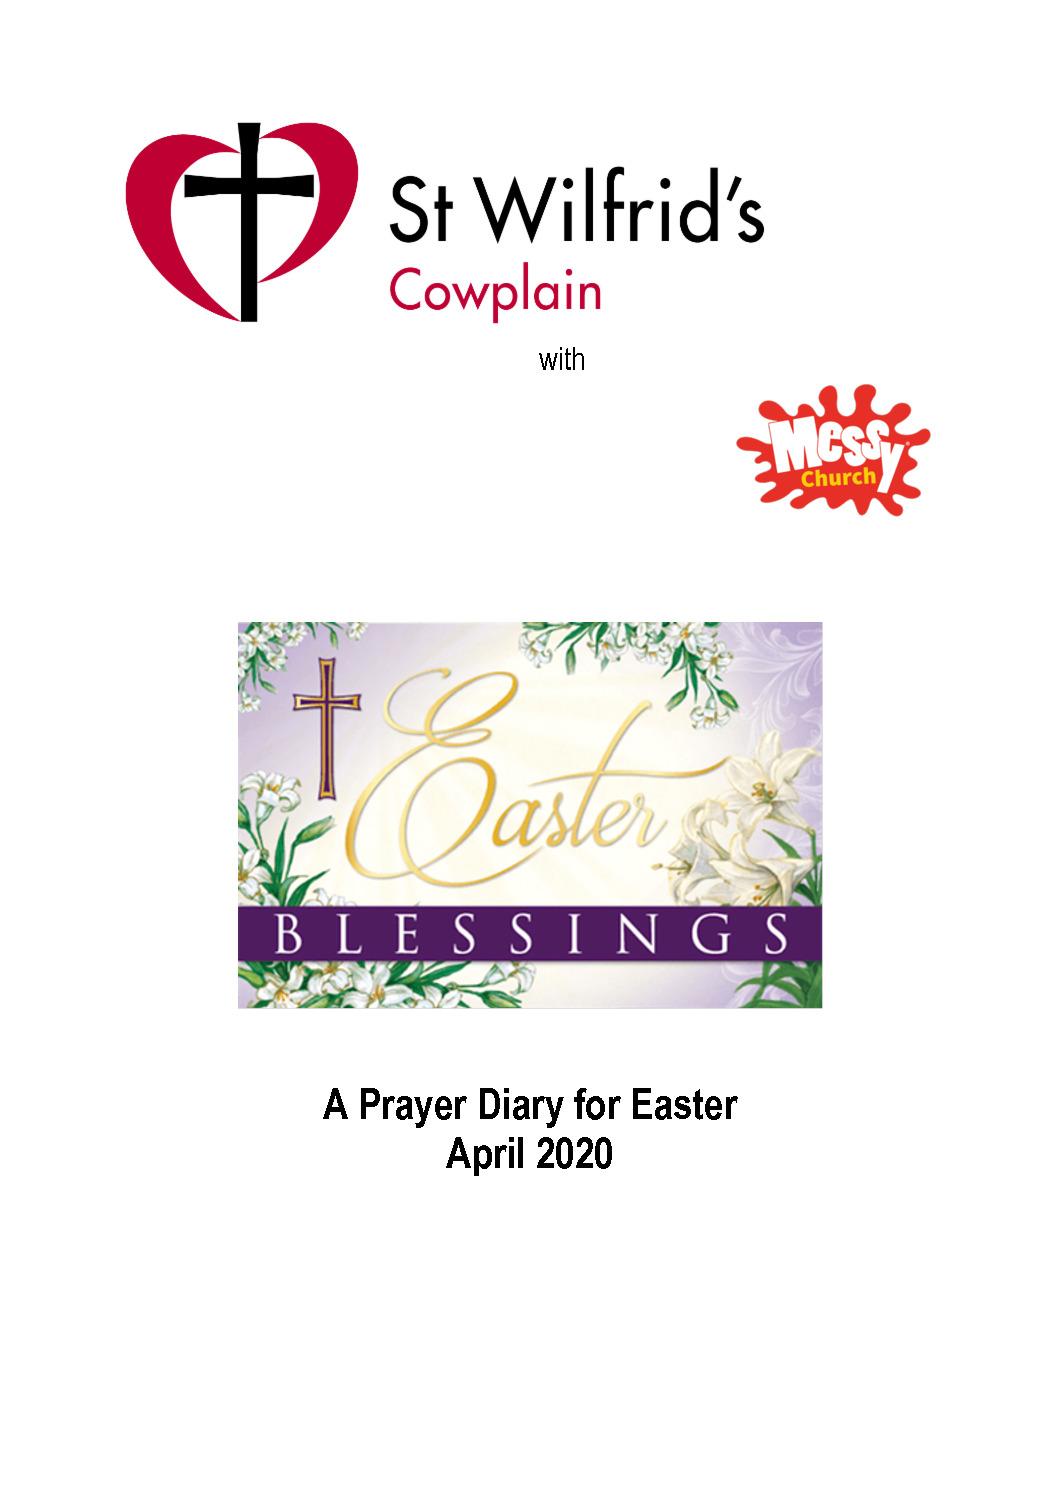 thumbnail of April 2020 prayer diary